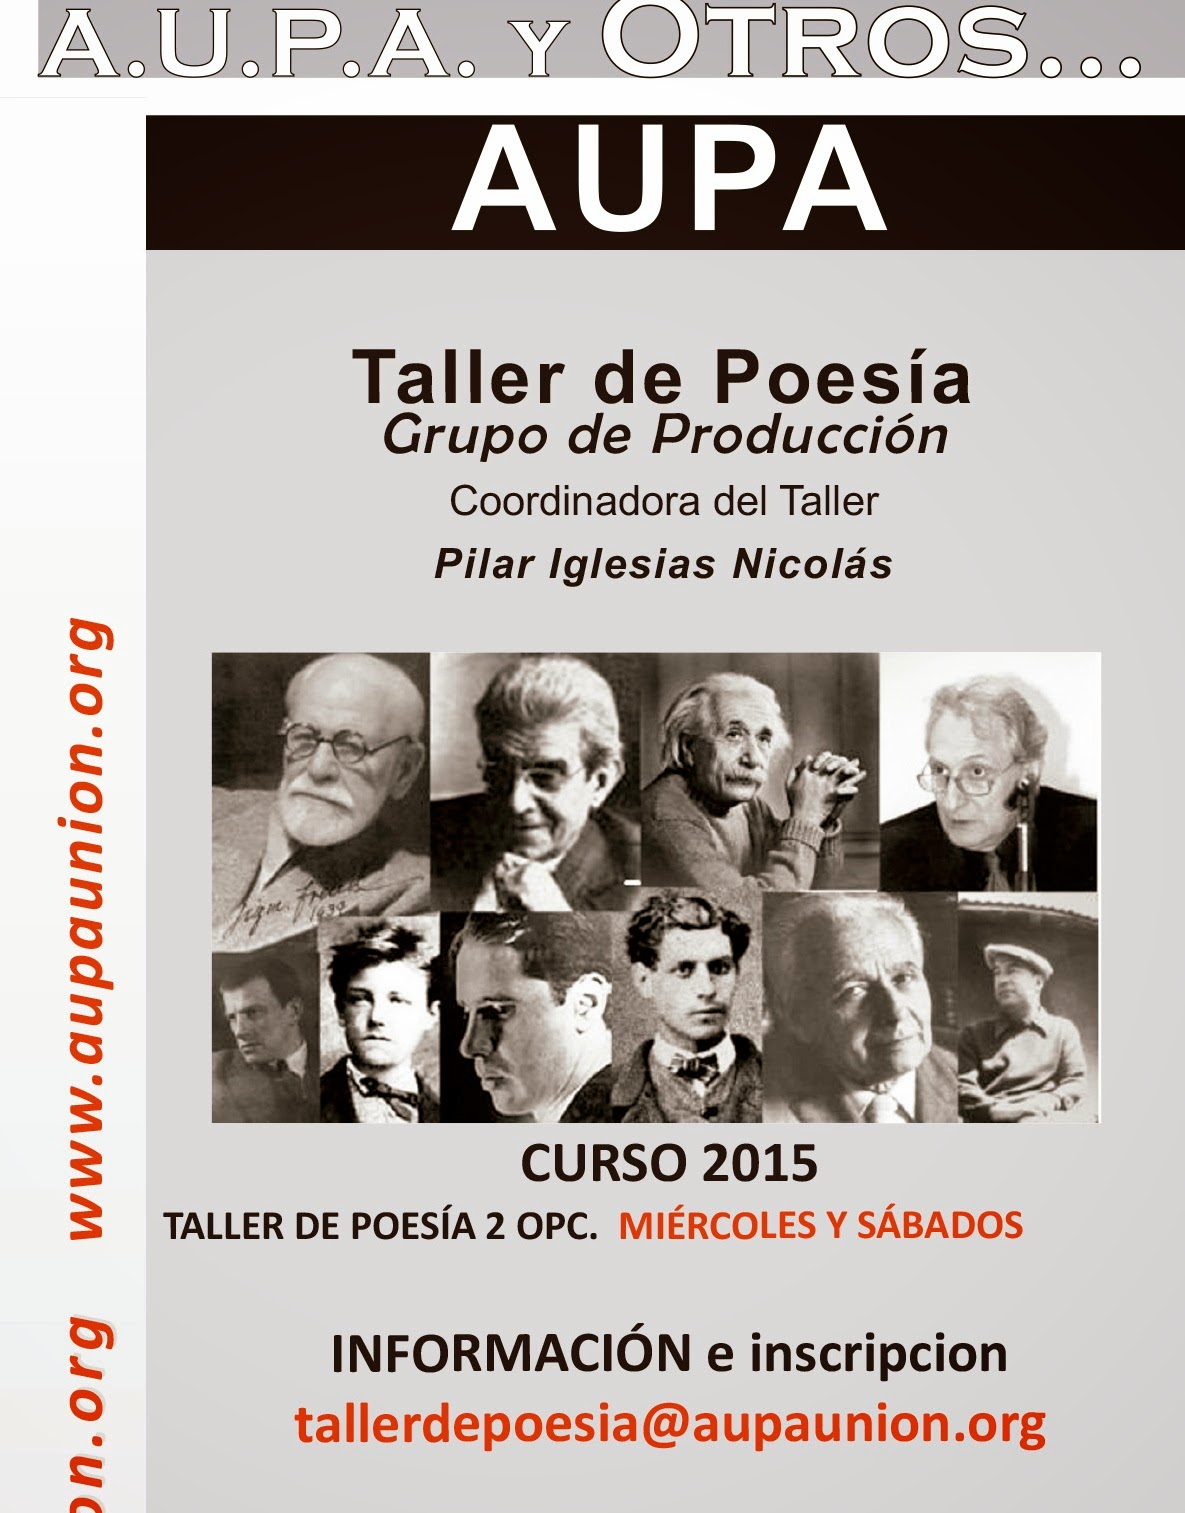 http://aupalalibreria.jimdo.com/aula-del-taller-y-audiovisuales/